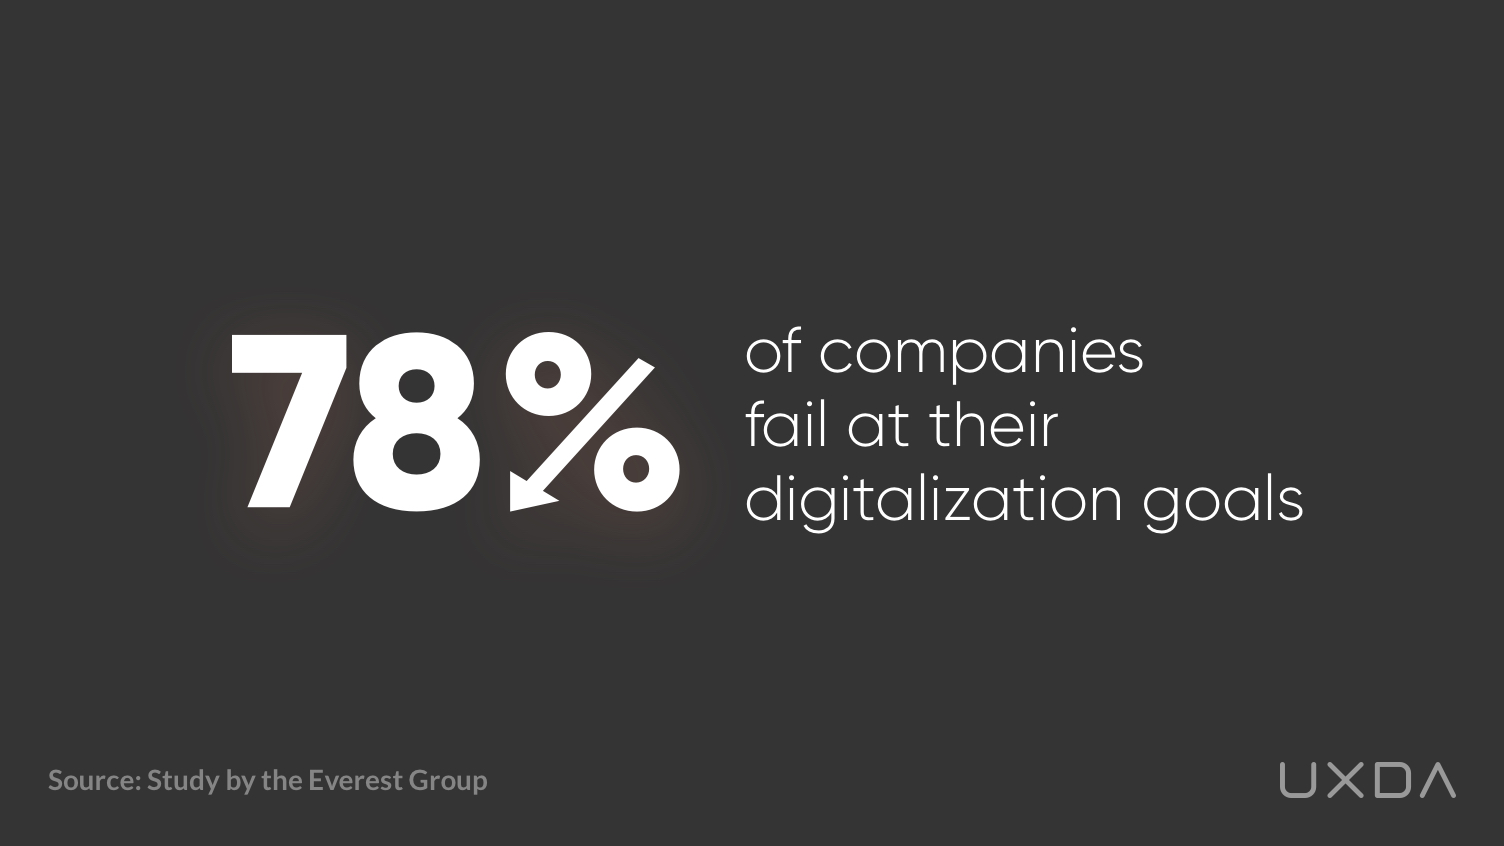 digital-transformation-in-banking-uxda-73-percent-fail-newest.jpg